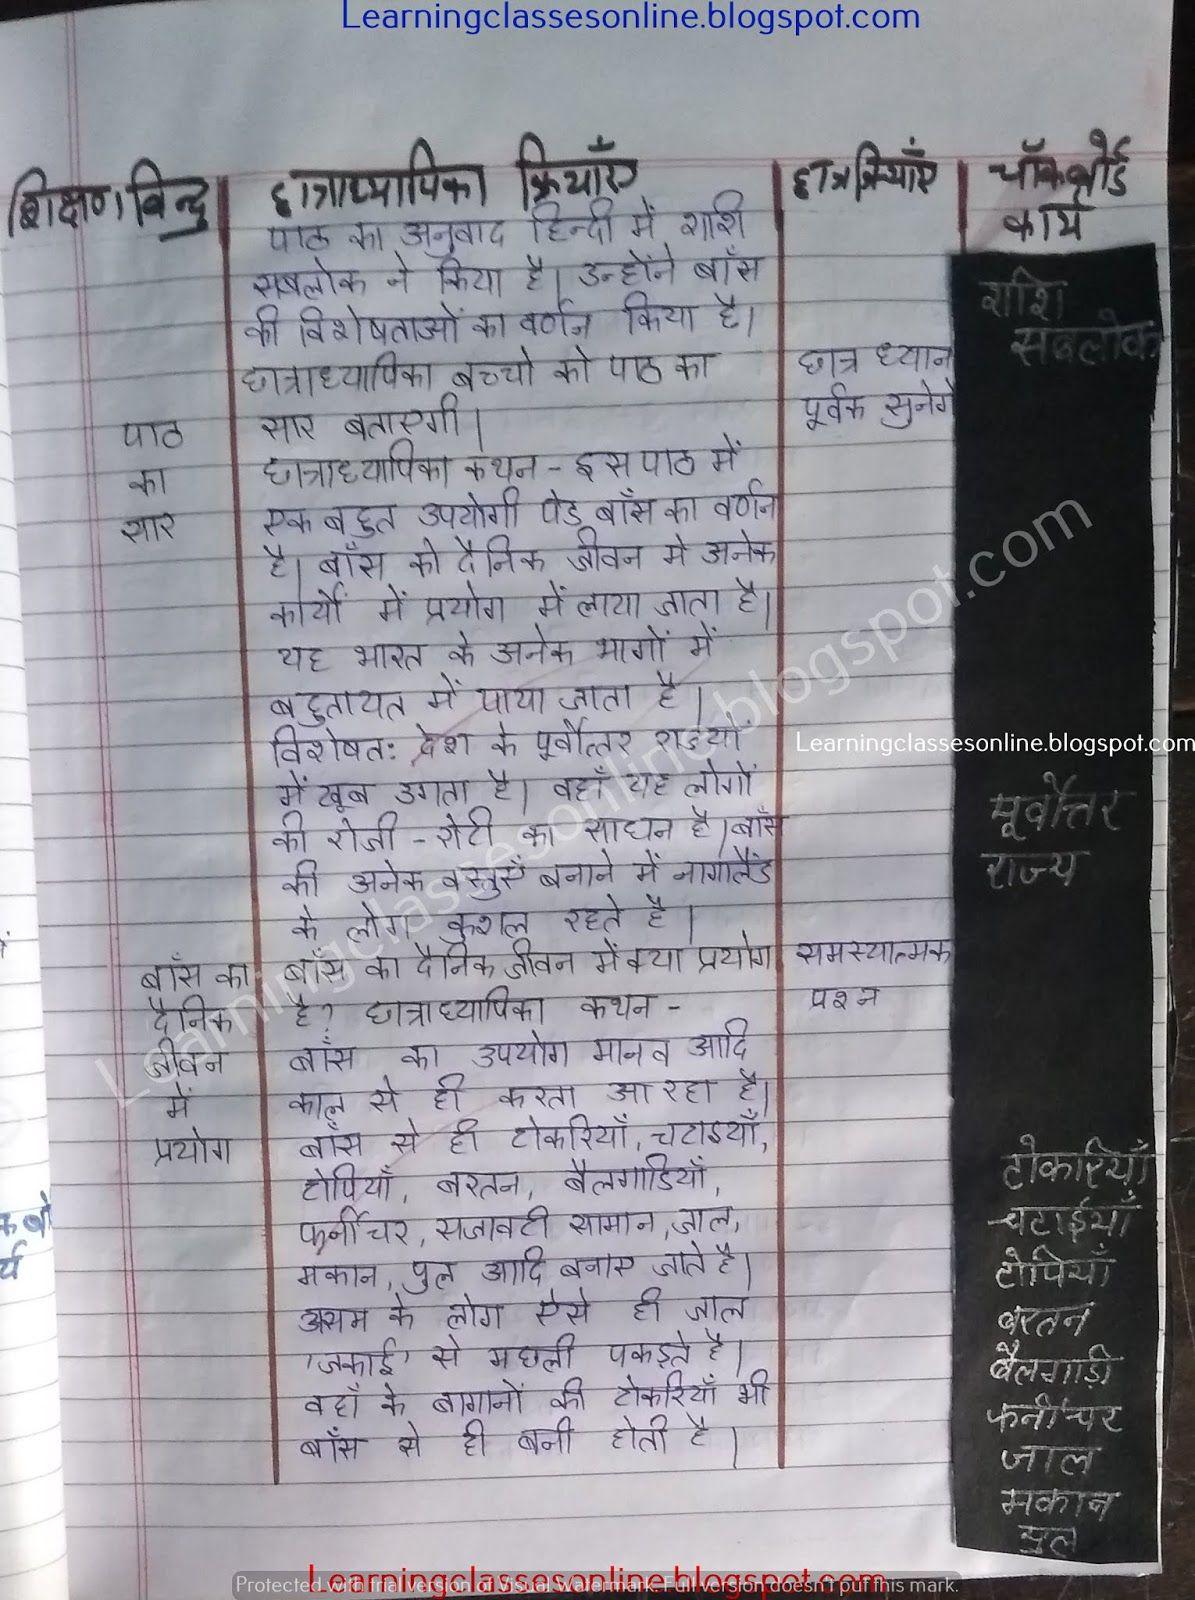 Lesson Plan In Hindi Class 6 Saans Saans Me Baas Vasant Bhag 1 Lesson Plan In Hindi Teaching Lessons Plans Lesson [ 1600 x 1195 Pixel ]